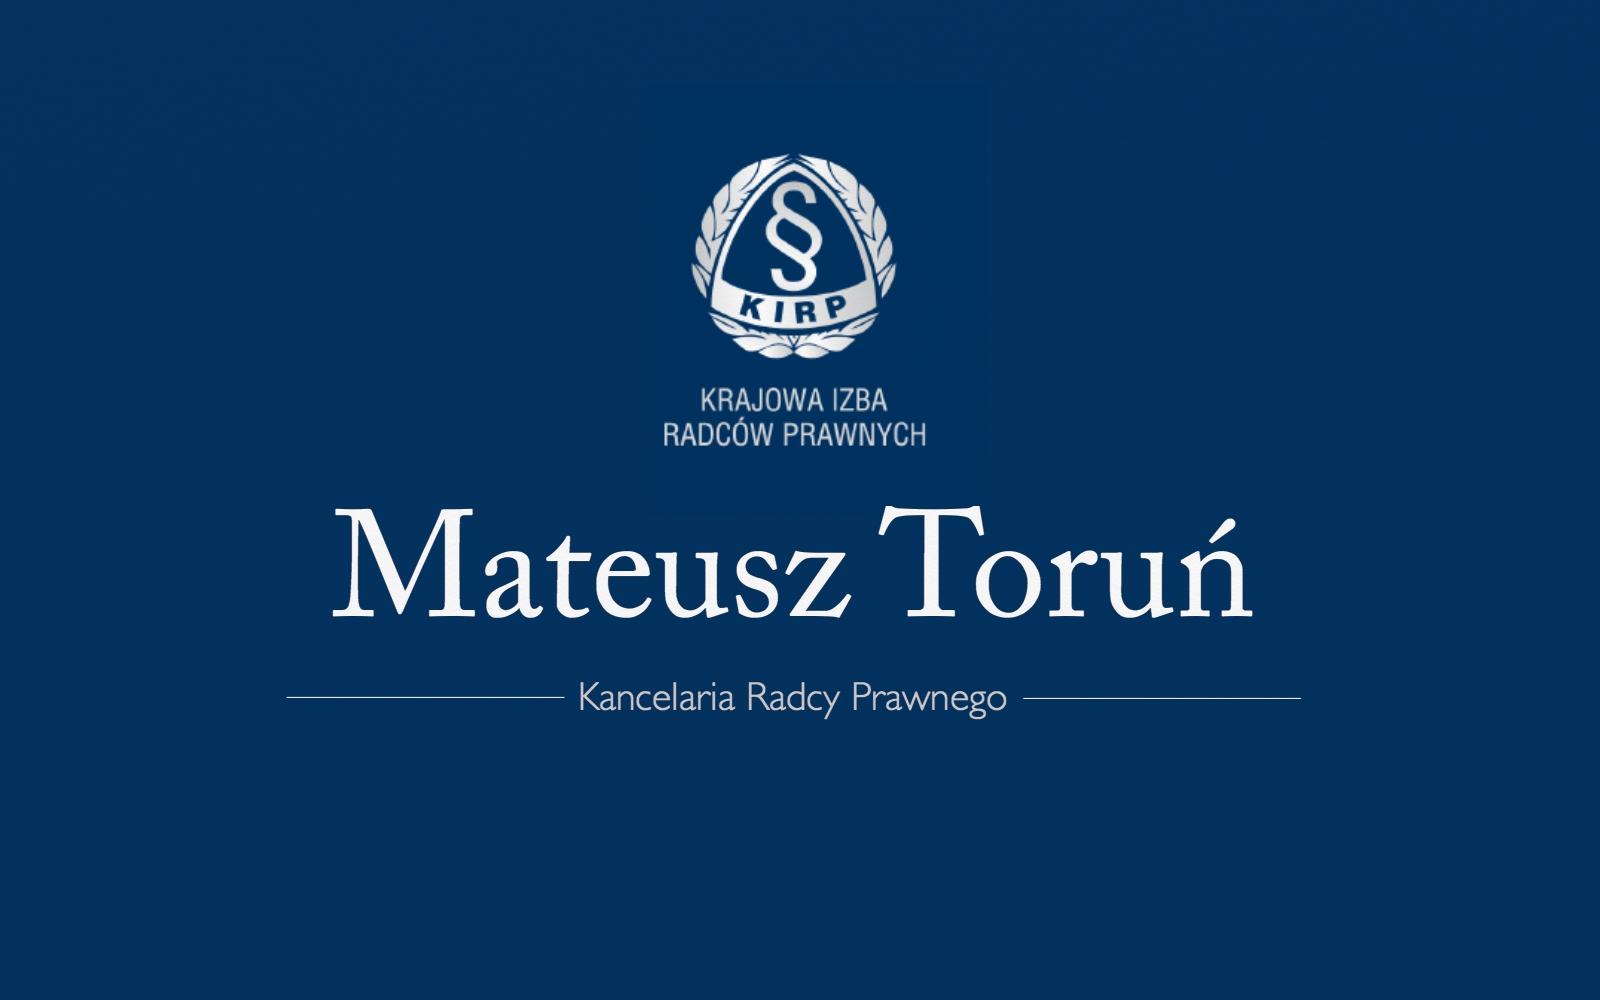 Mateusz Toruń - Radca Prawny